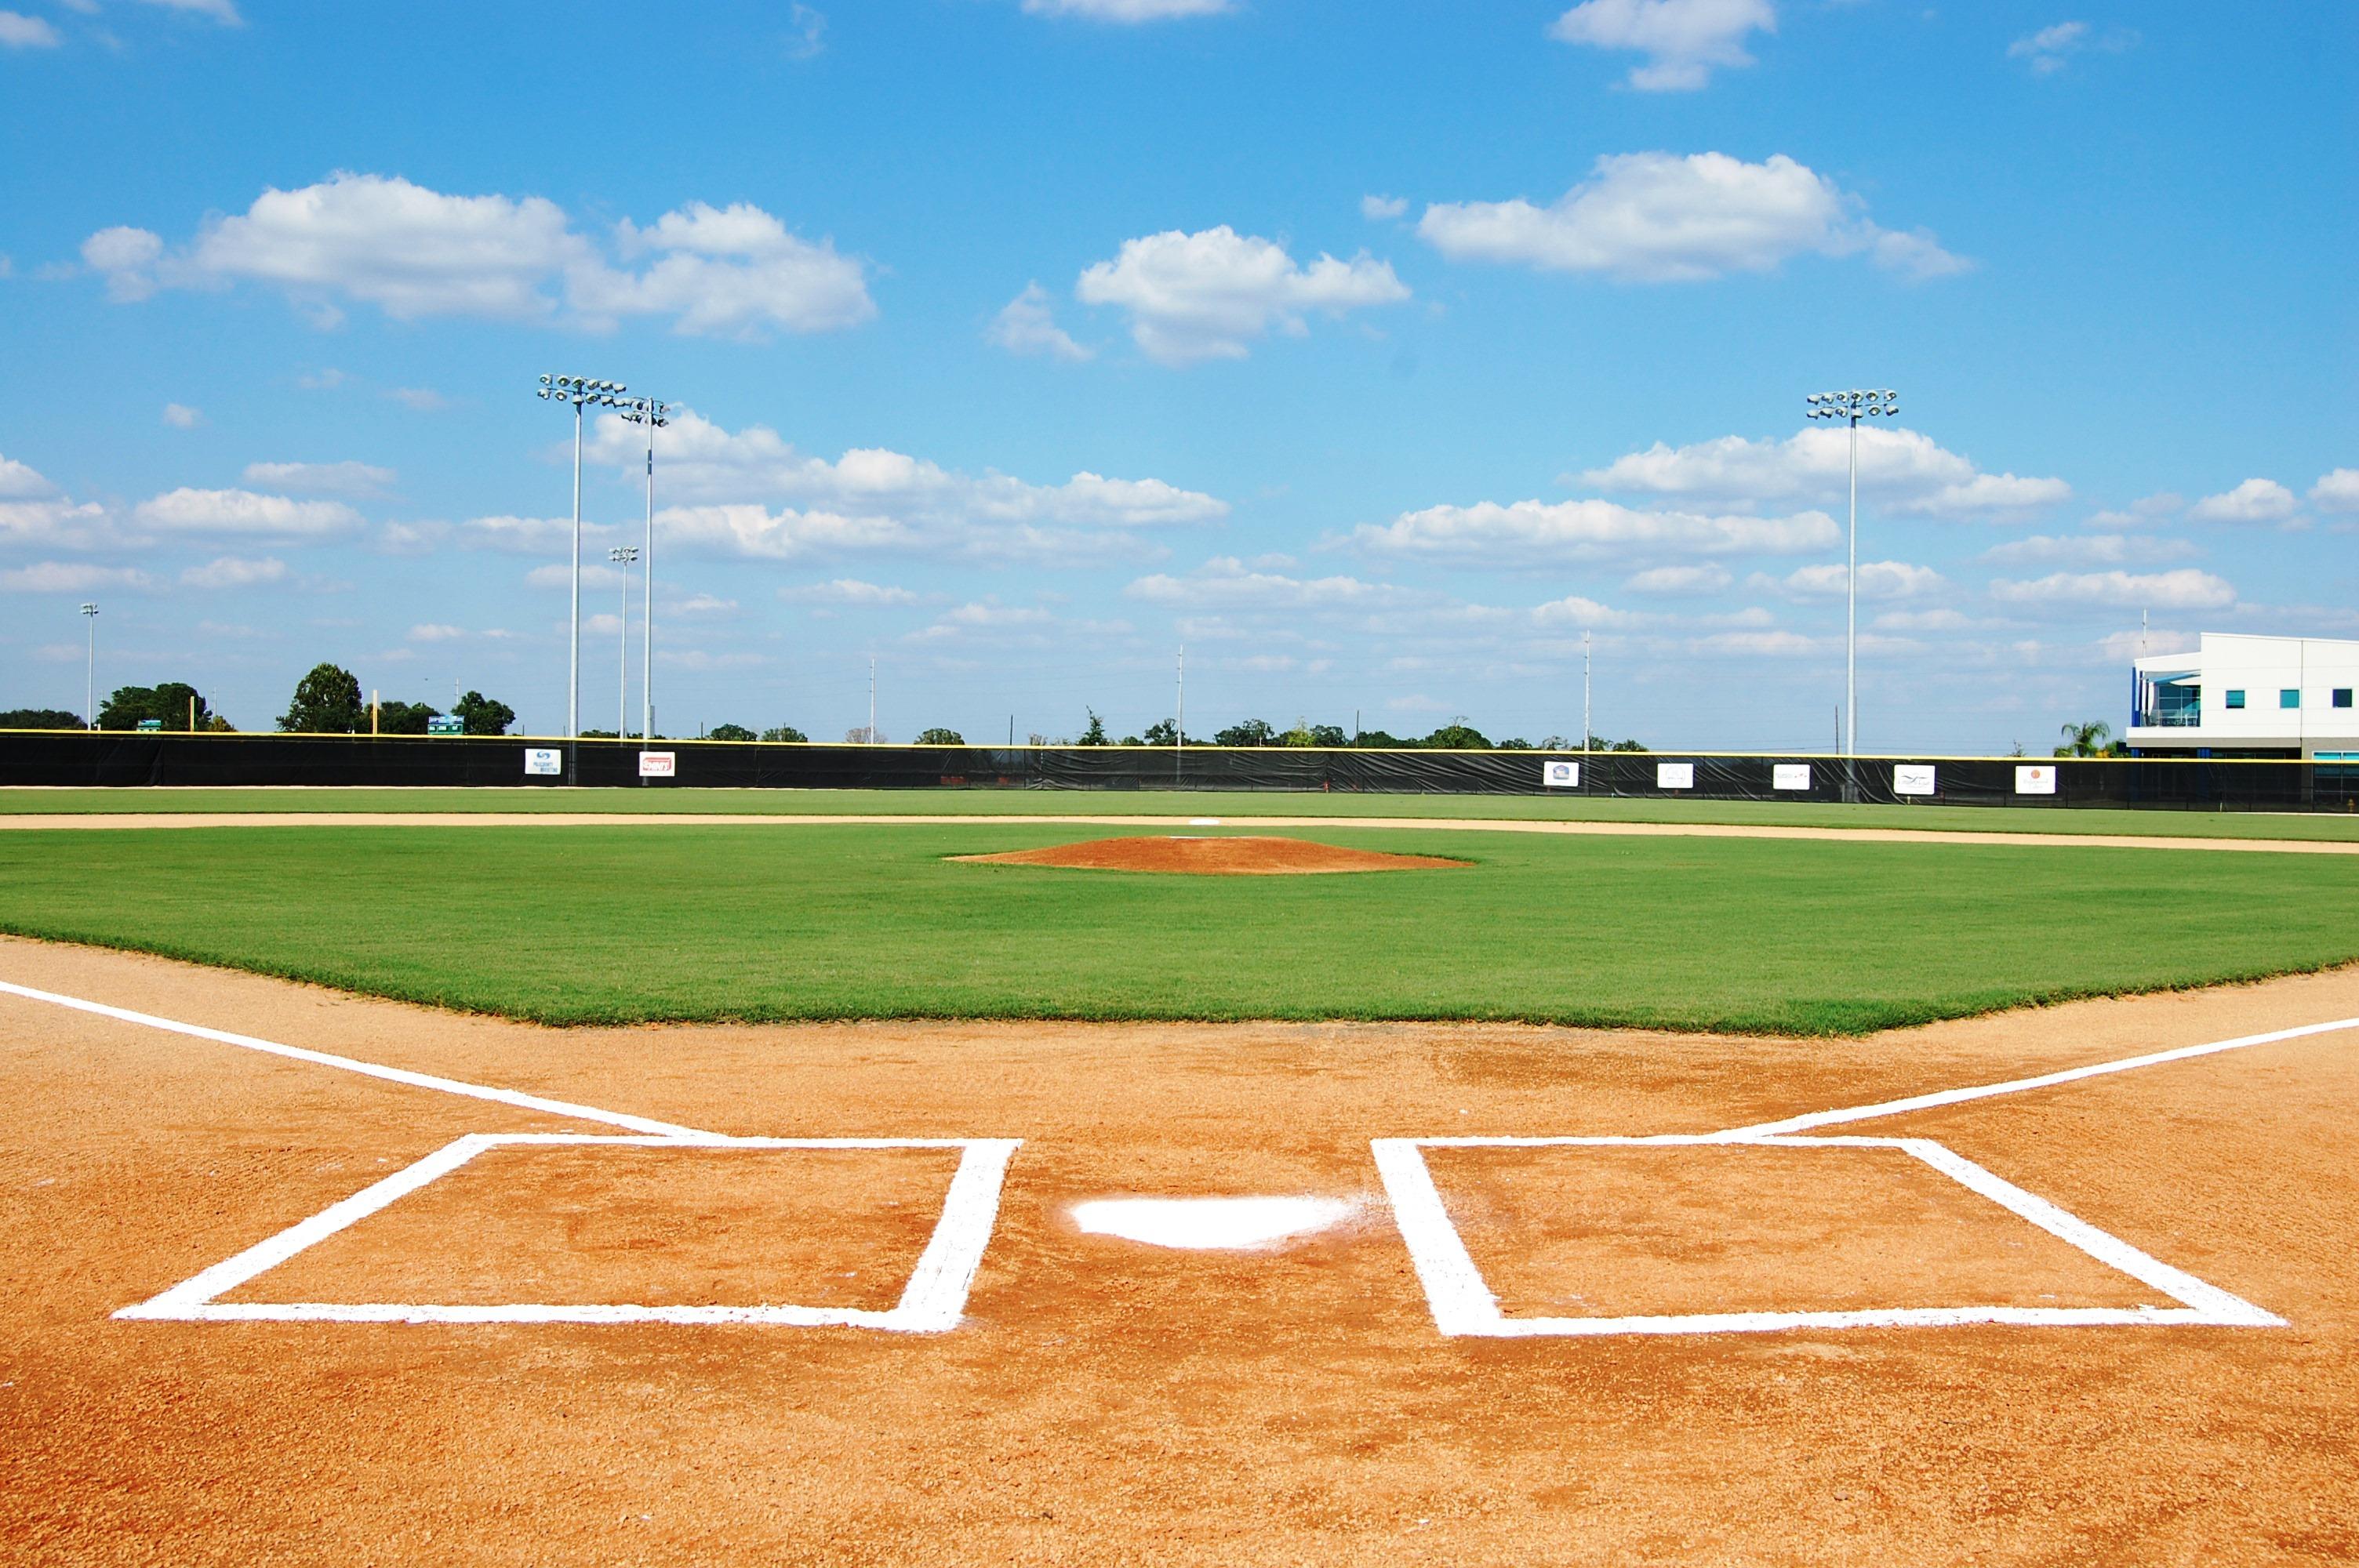 Baseball Field Background - WallpaperSafari